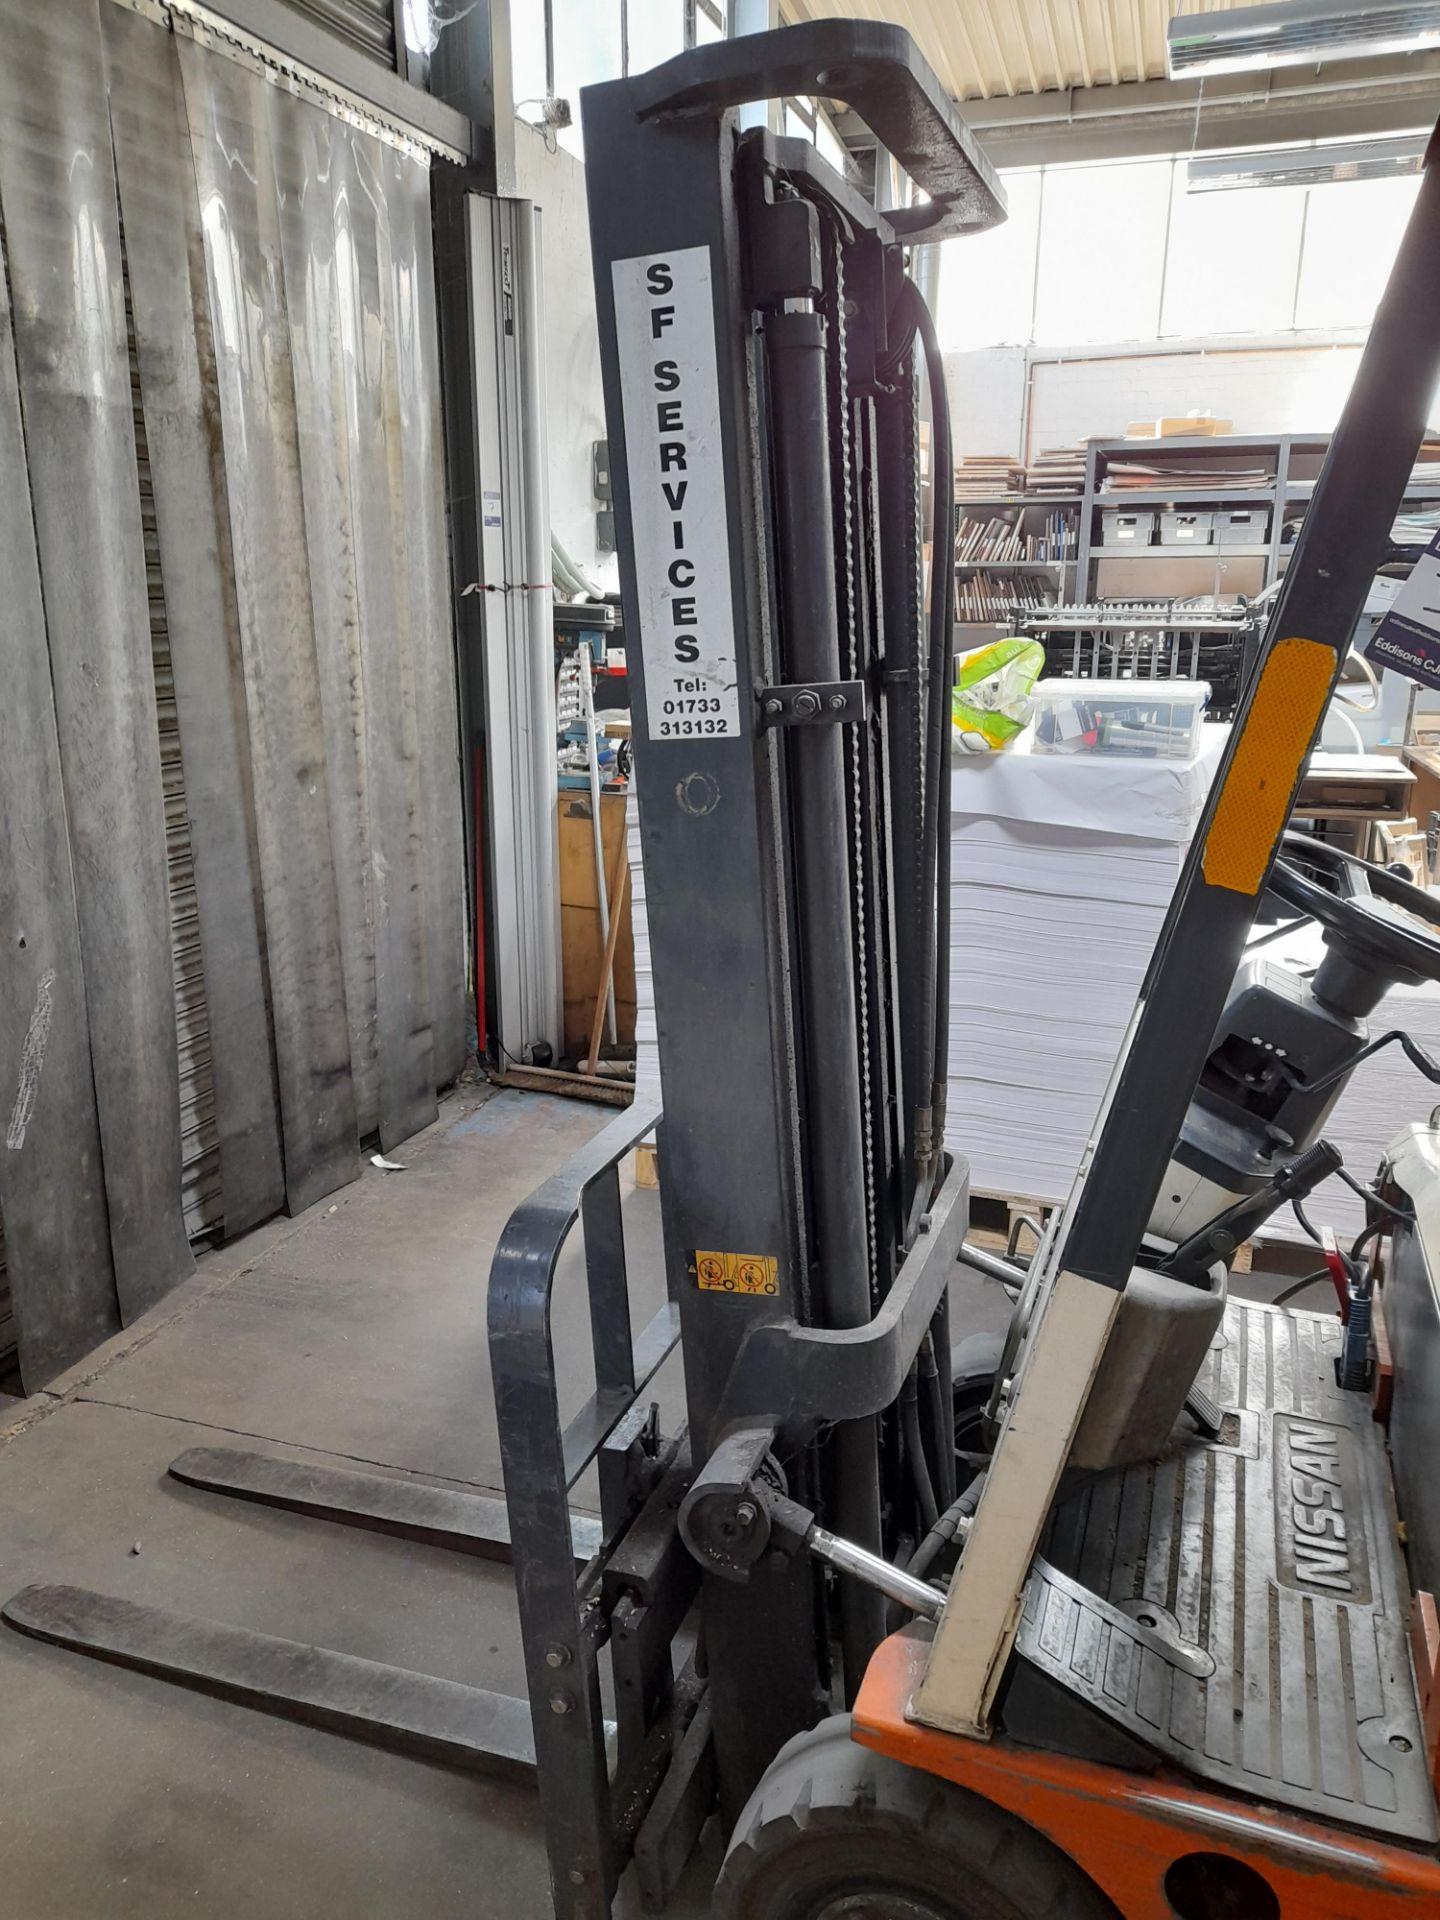 Nissan N01438-U electric 3 wheel forklift truck, C - Image 3 of 5